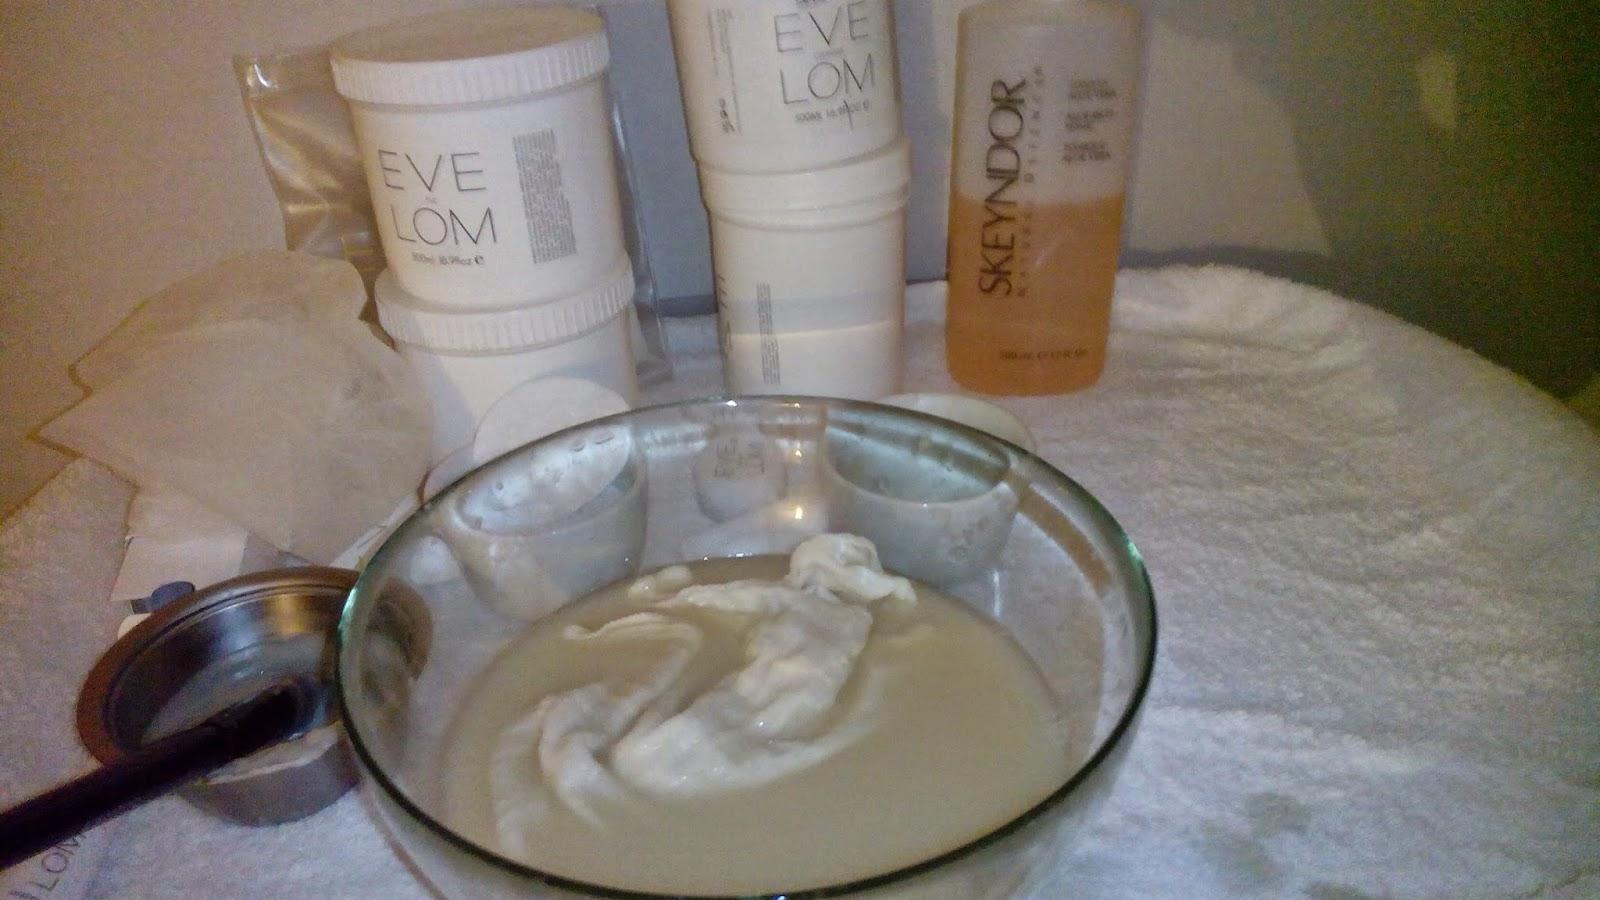 elenkolr fashion blog probar el eve lom tratamiento belleza hedonai gijon